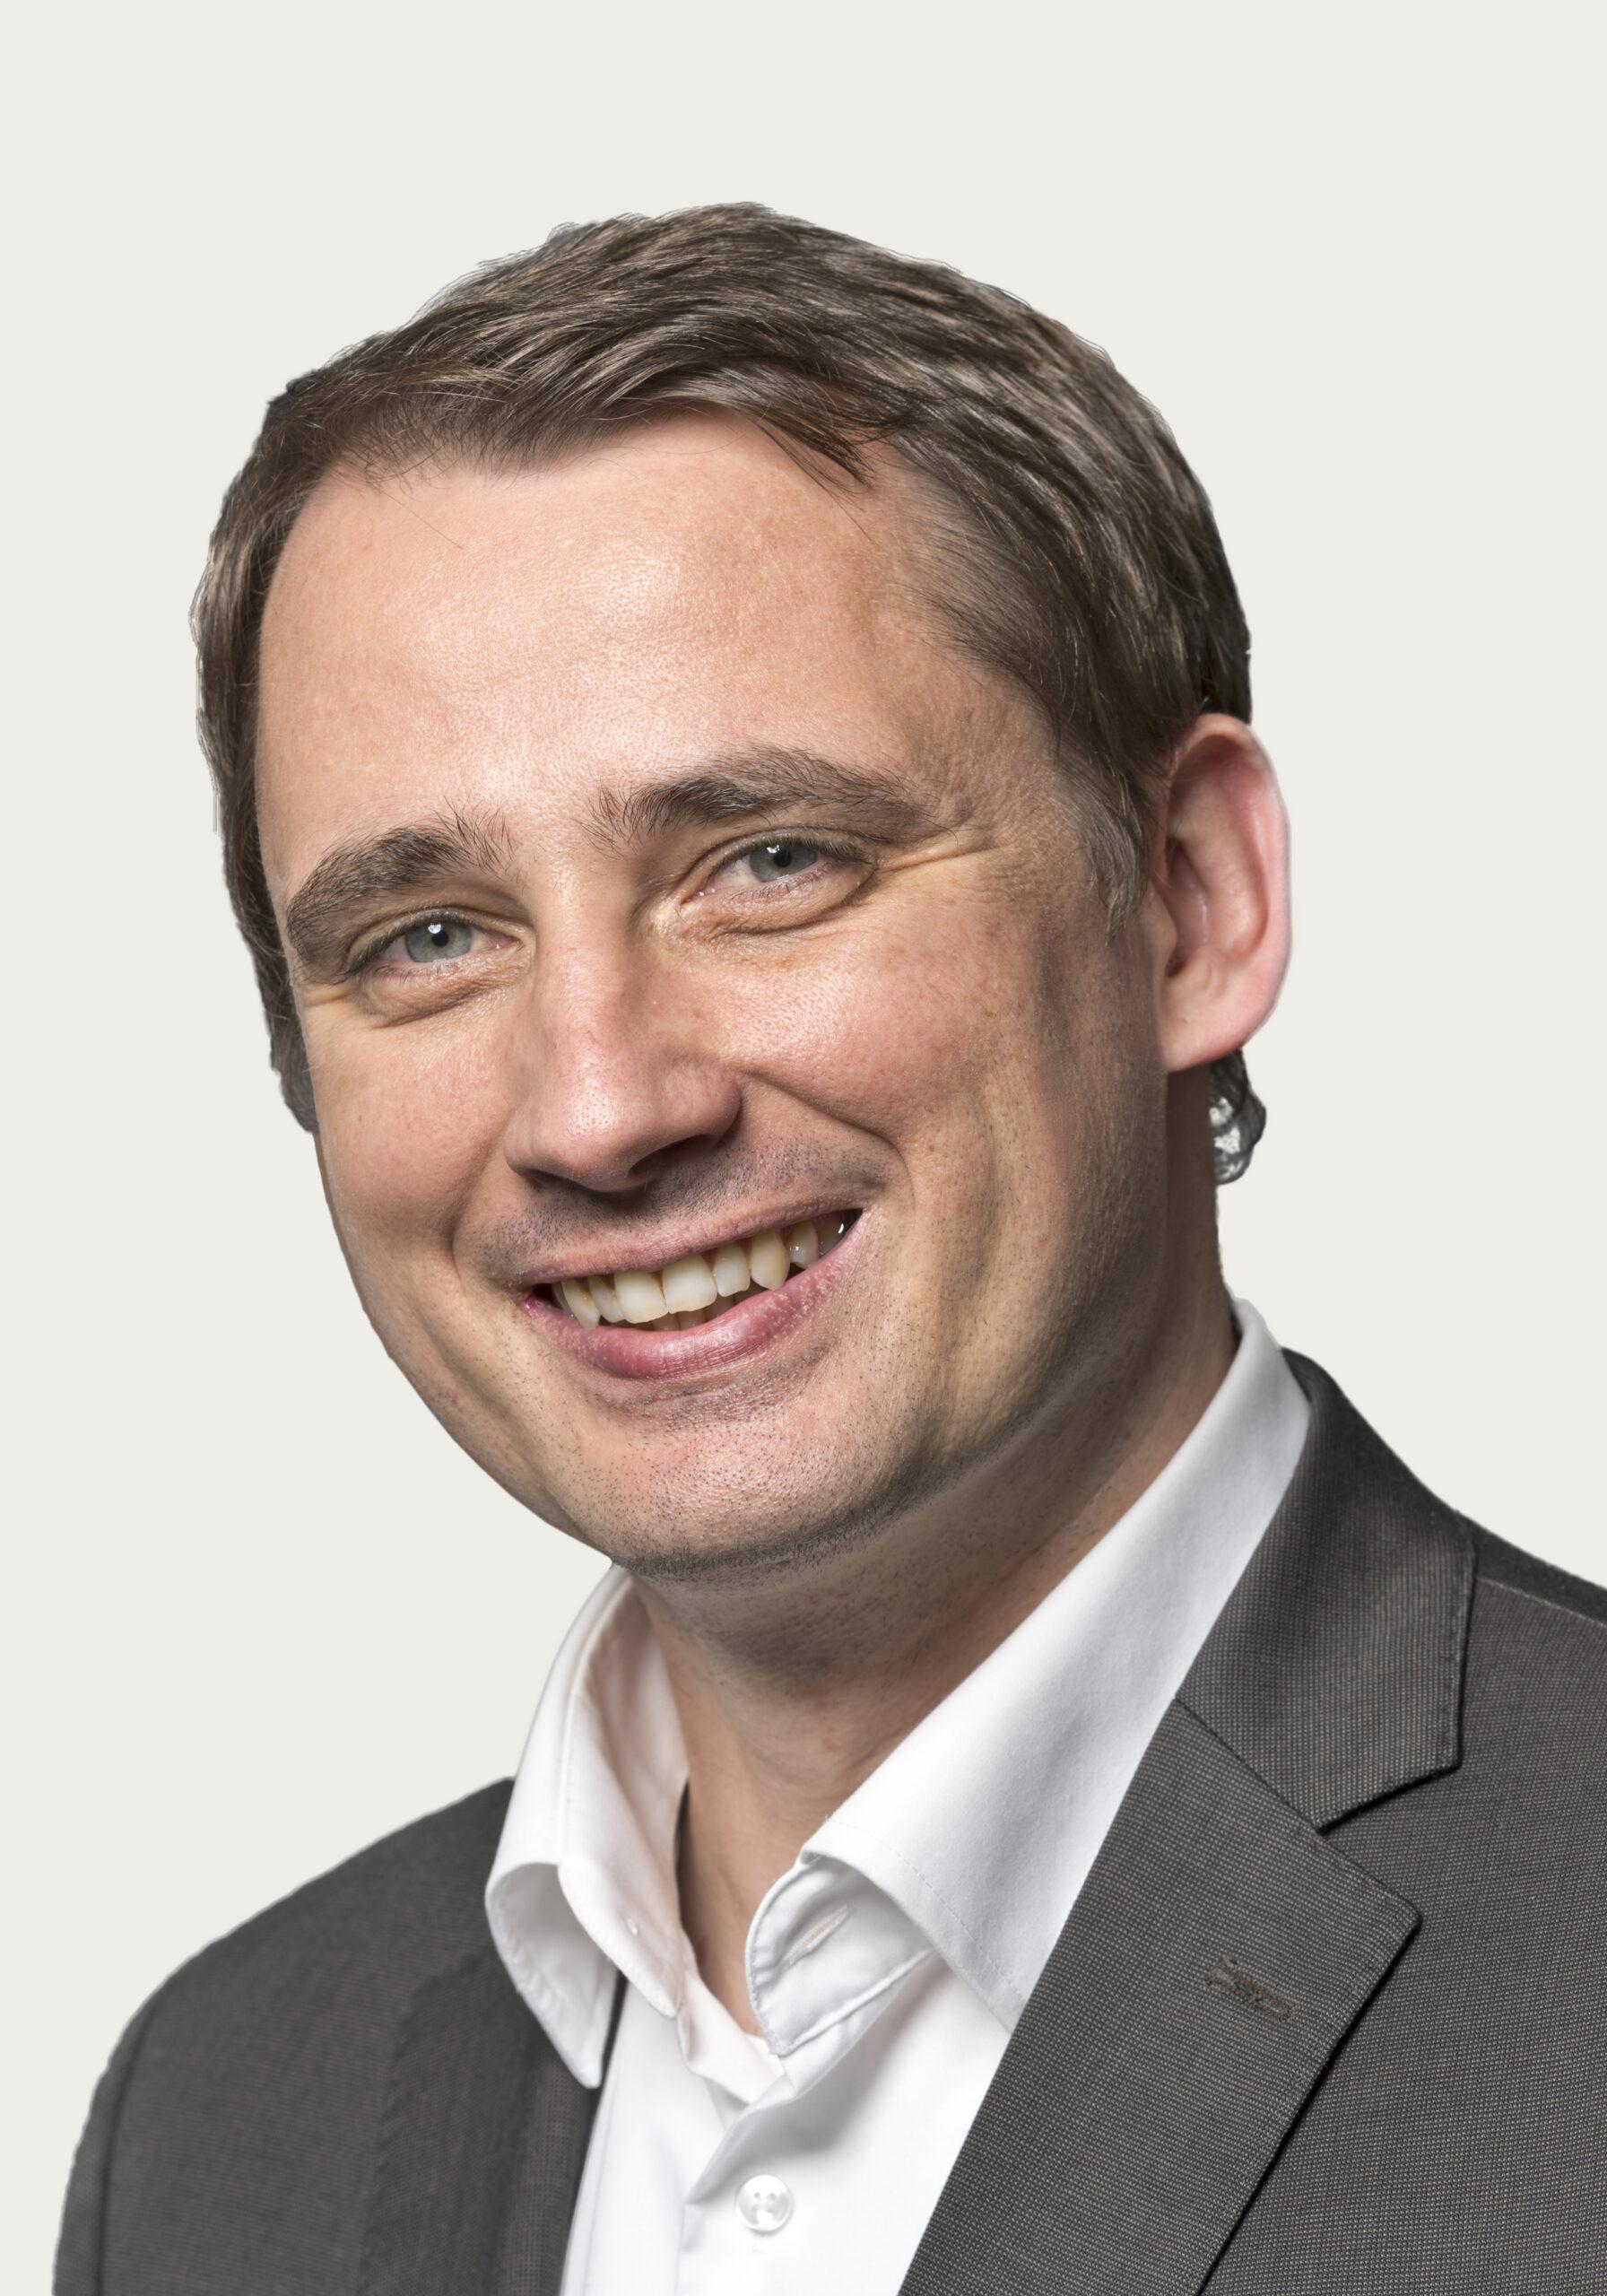 Dr. Markus Seibold